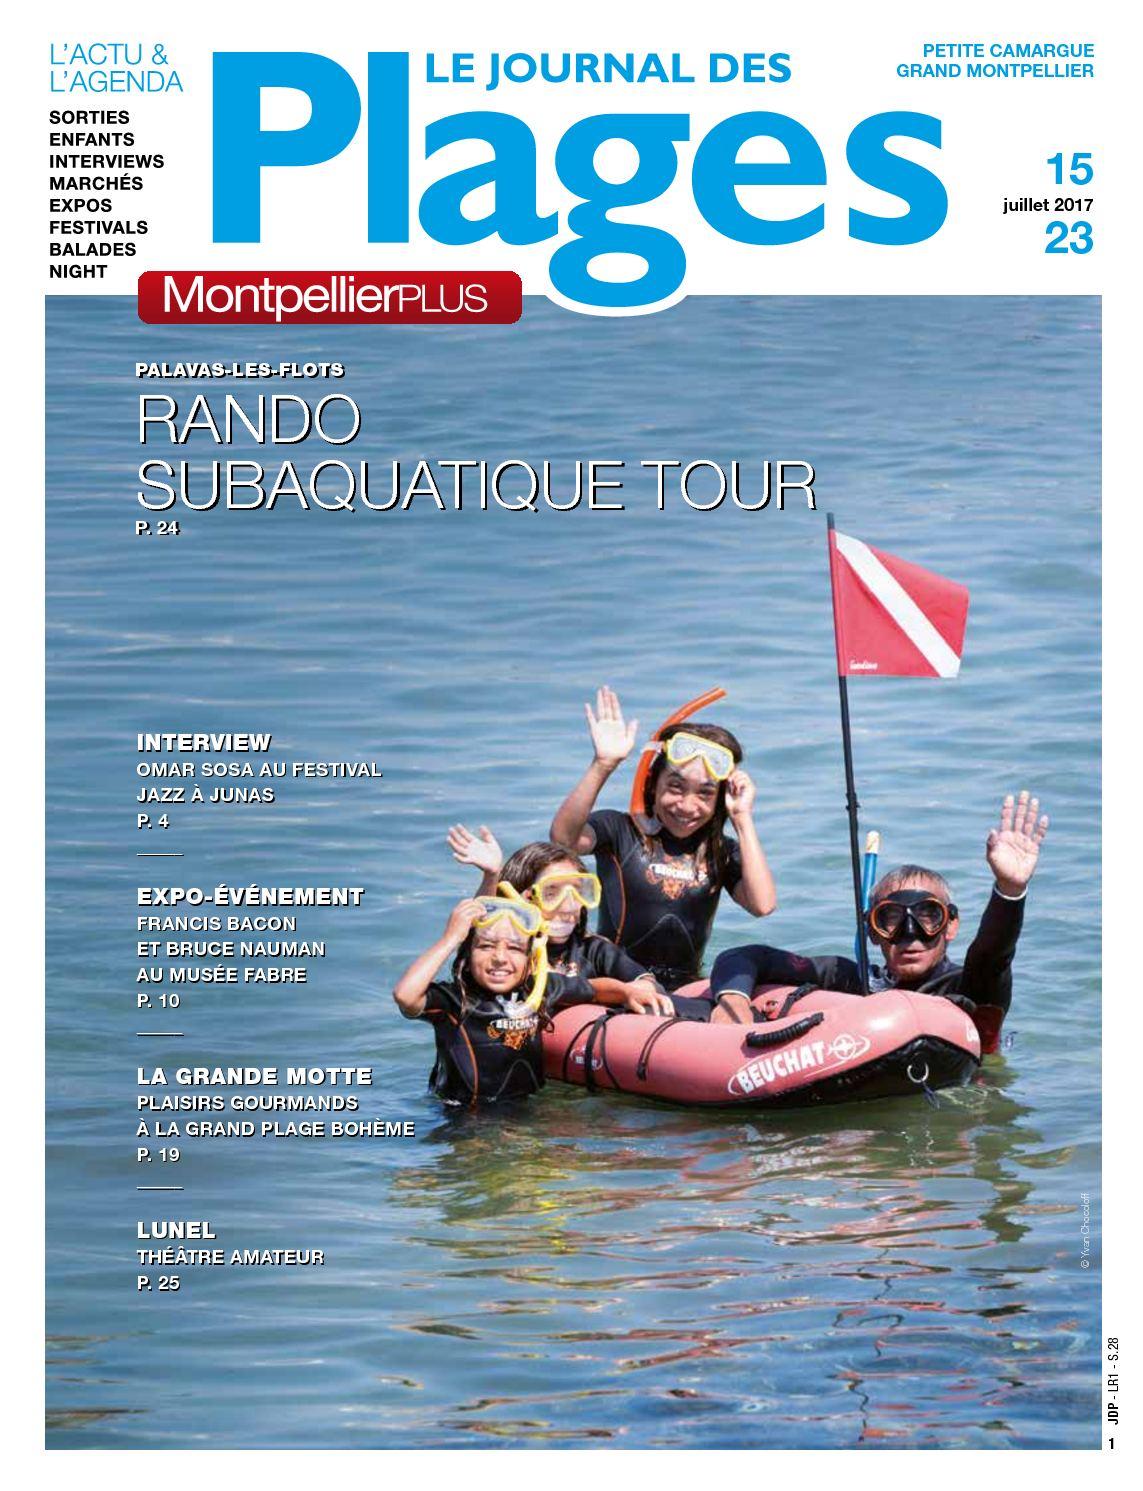 Camargue Montpellier 15 23 Petite au 2017 juillet Grand Calaméo Itw5qw